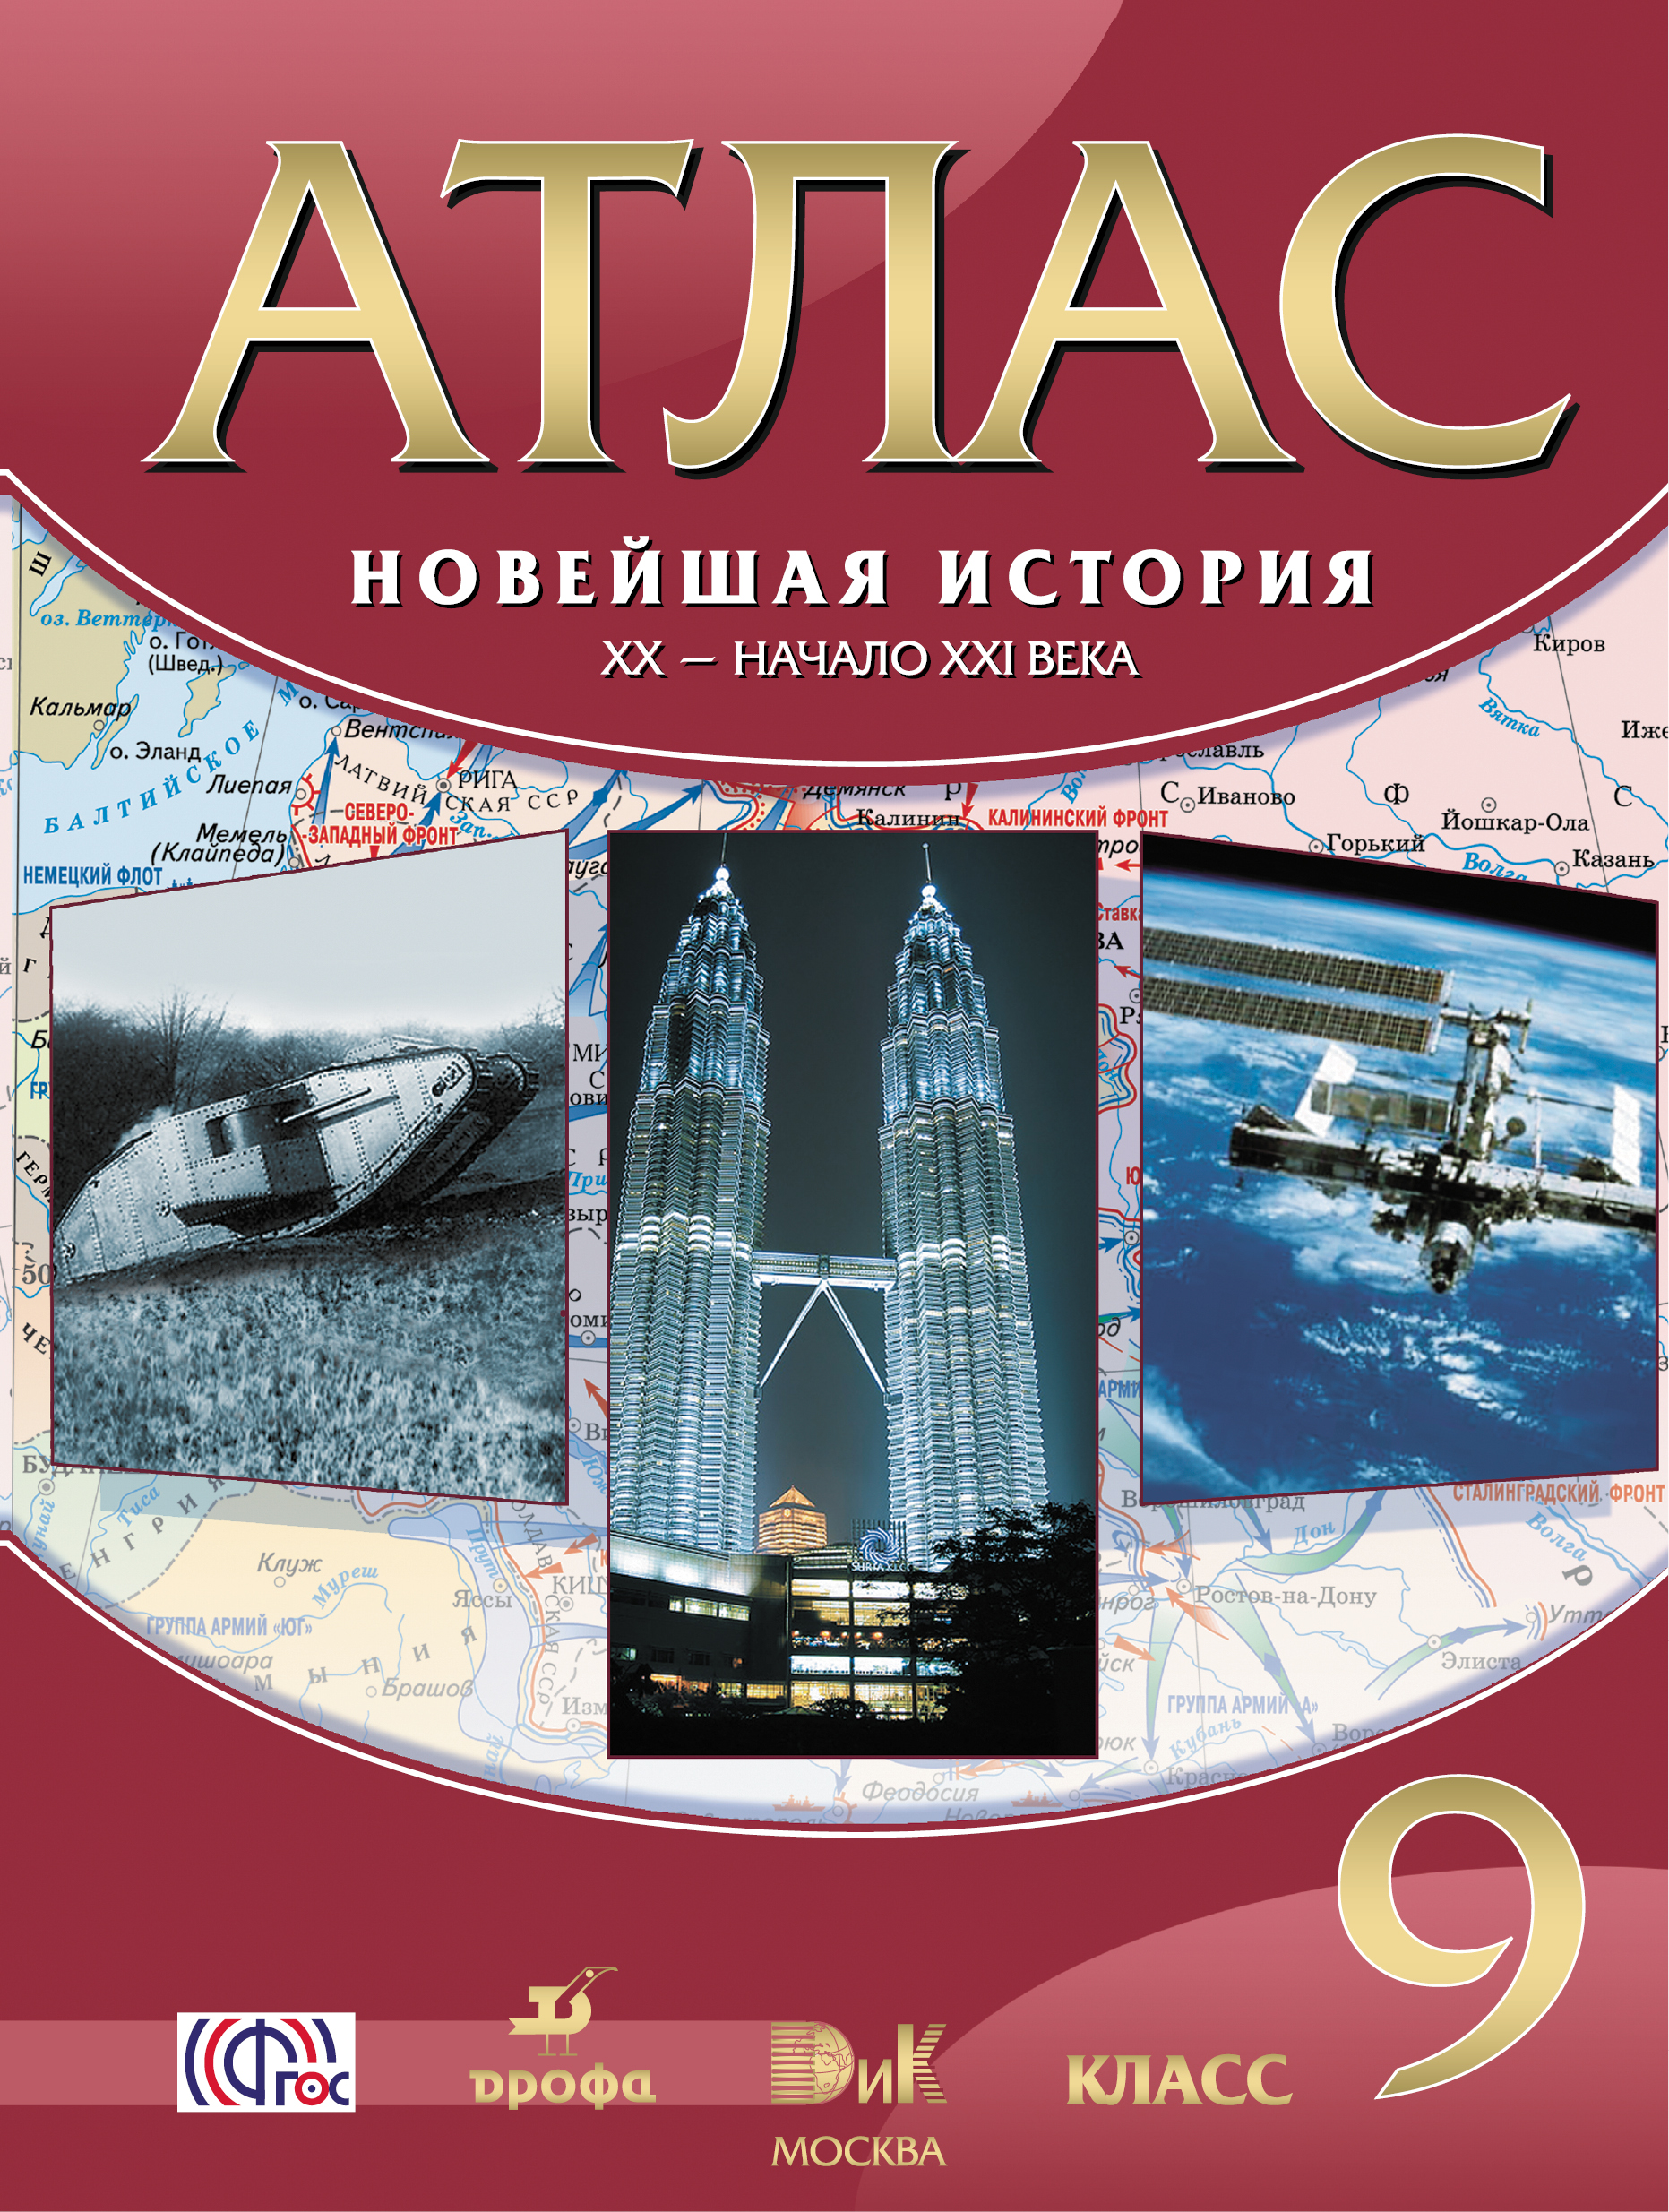 Атлас: Новейшая история XX - начало XXIв 9кл 40cтр